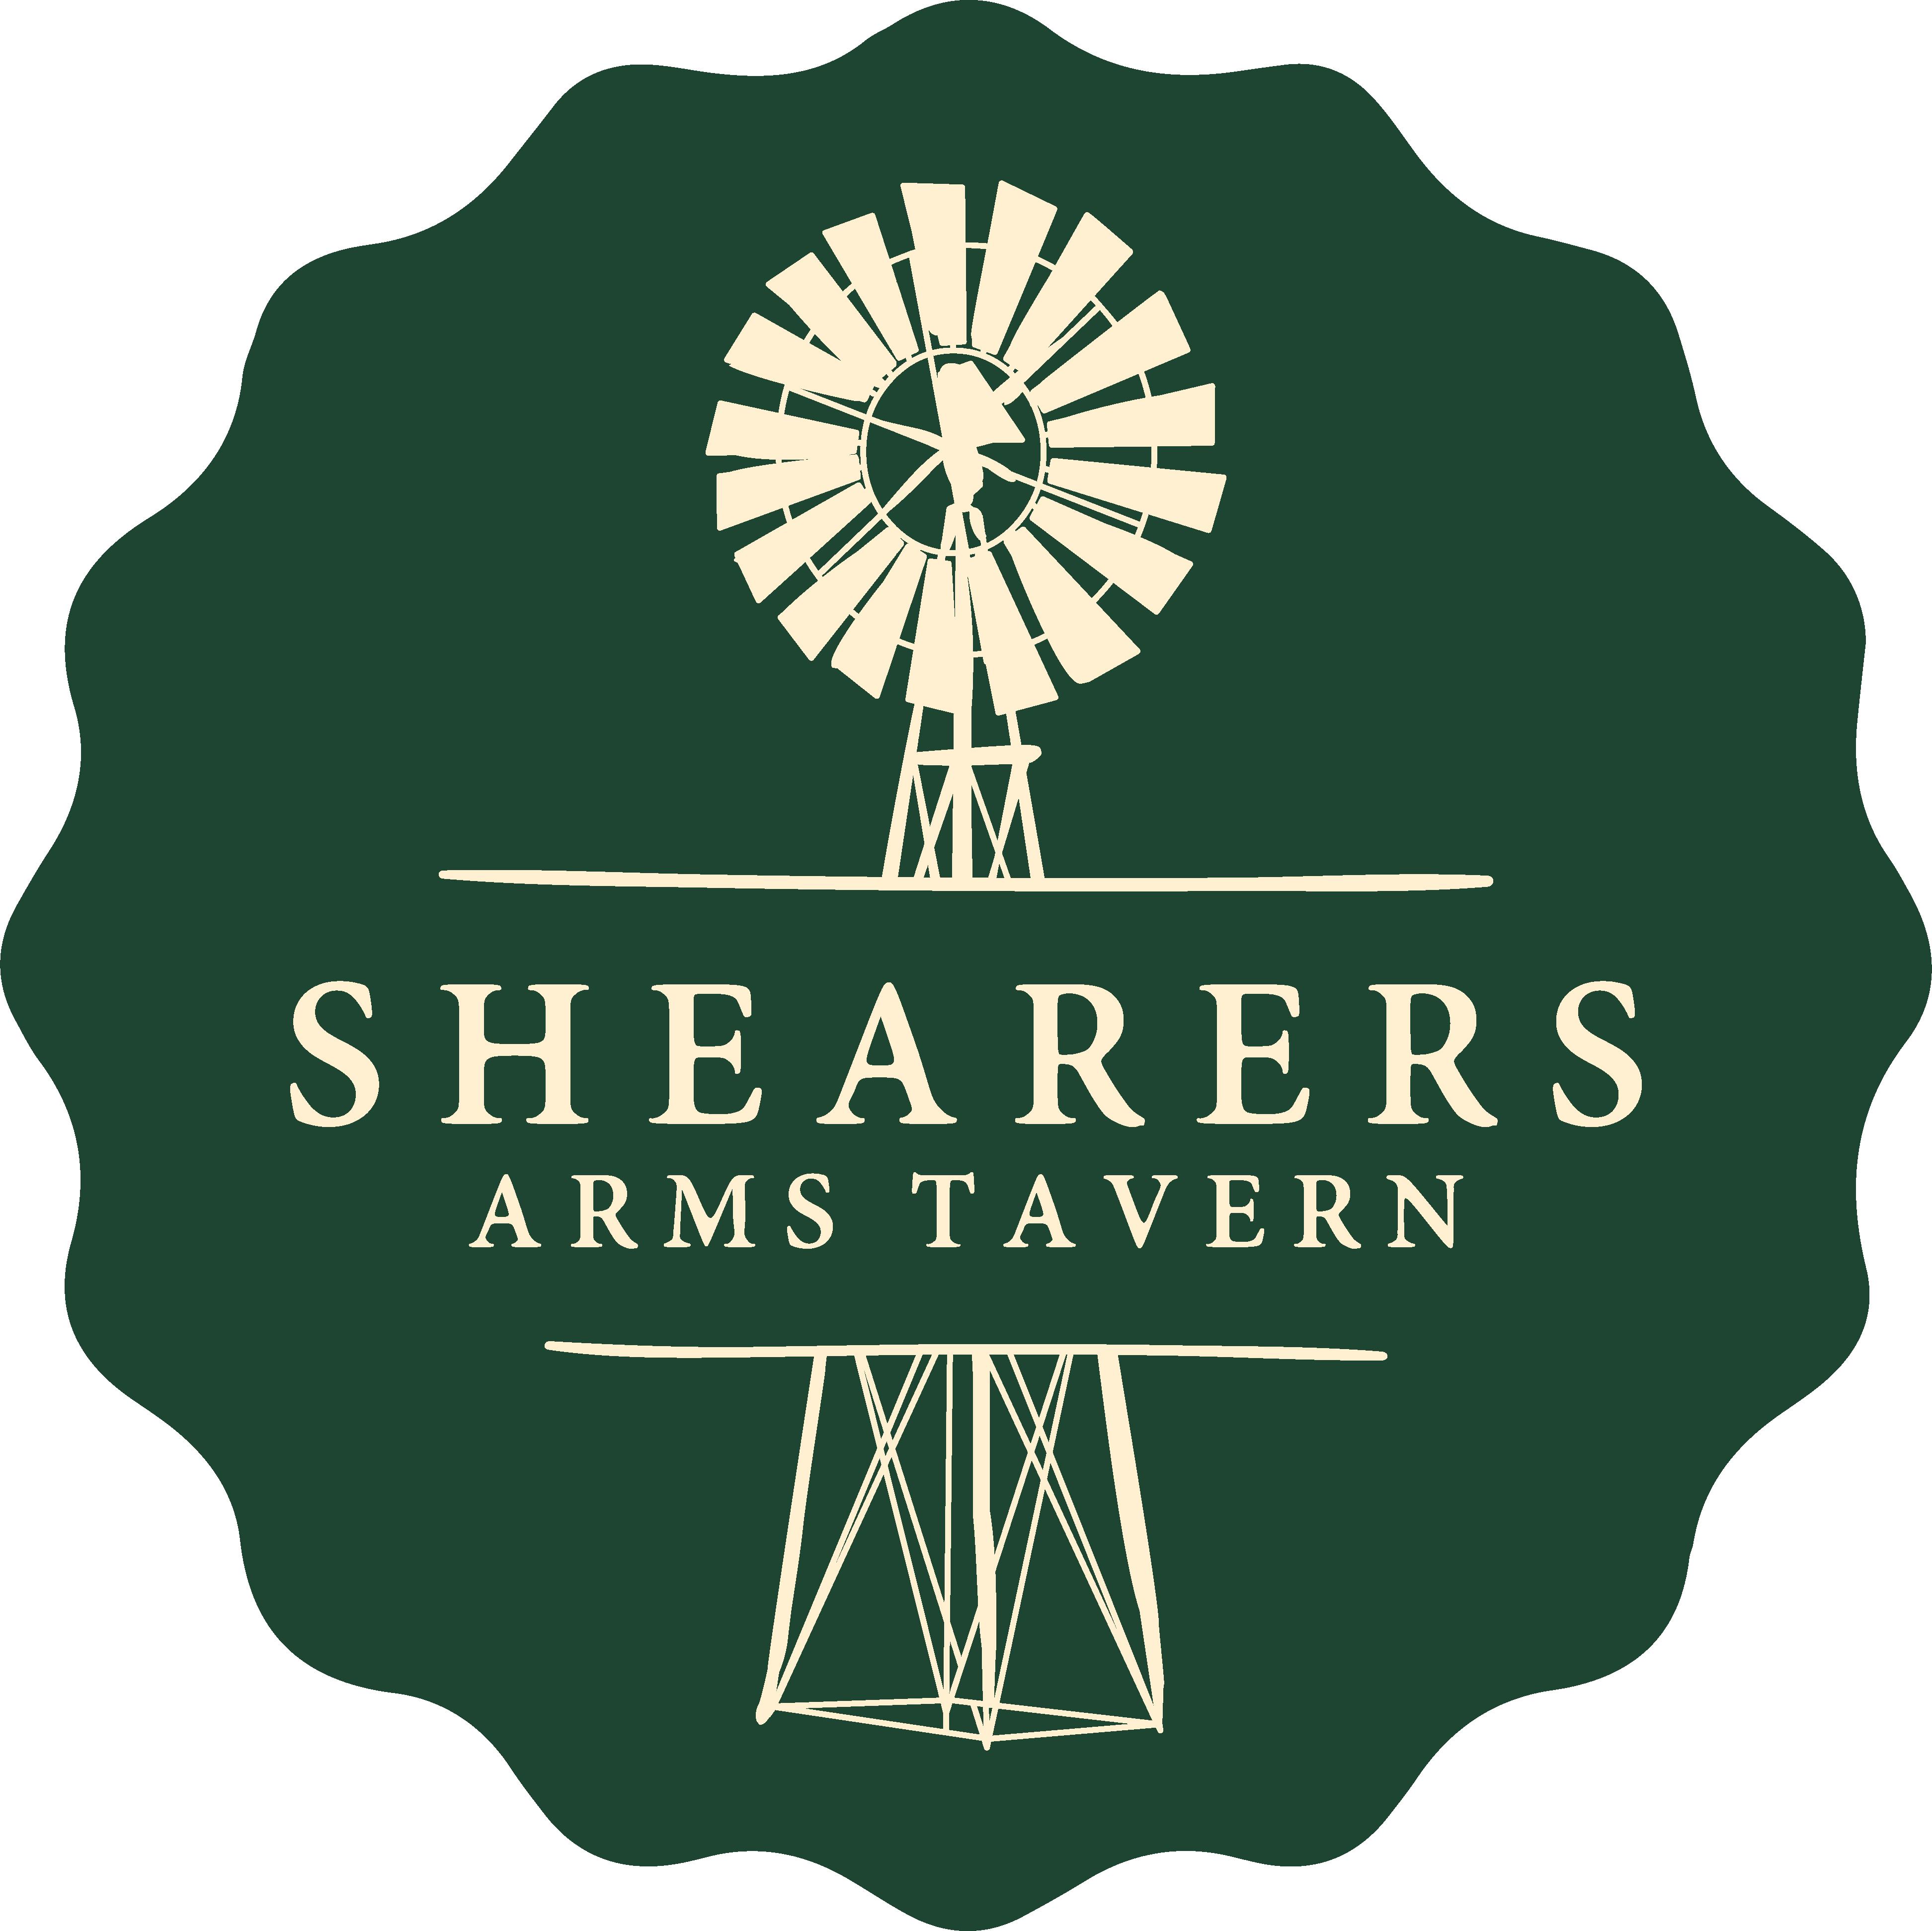 Shearer's Arms Tavern